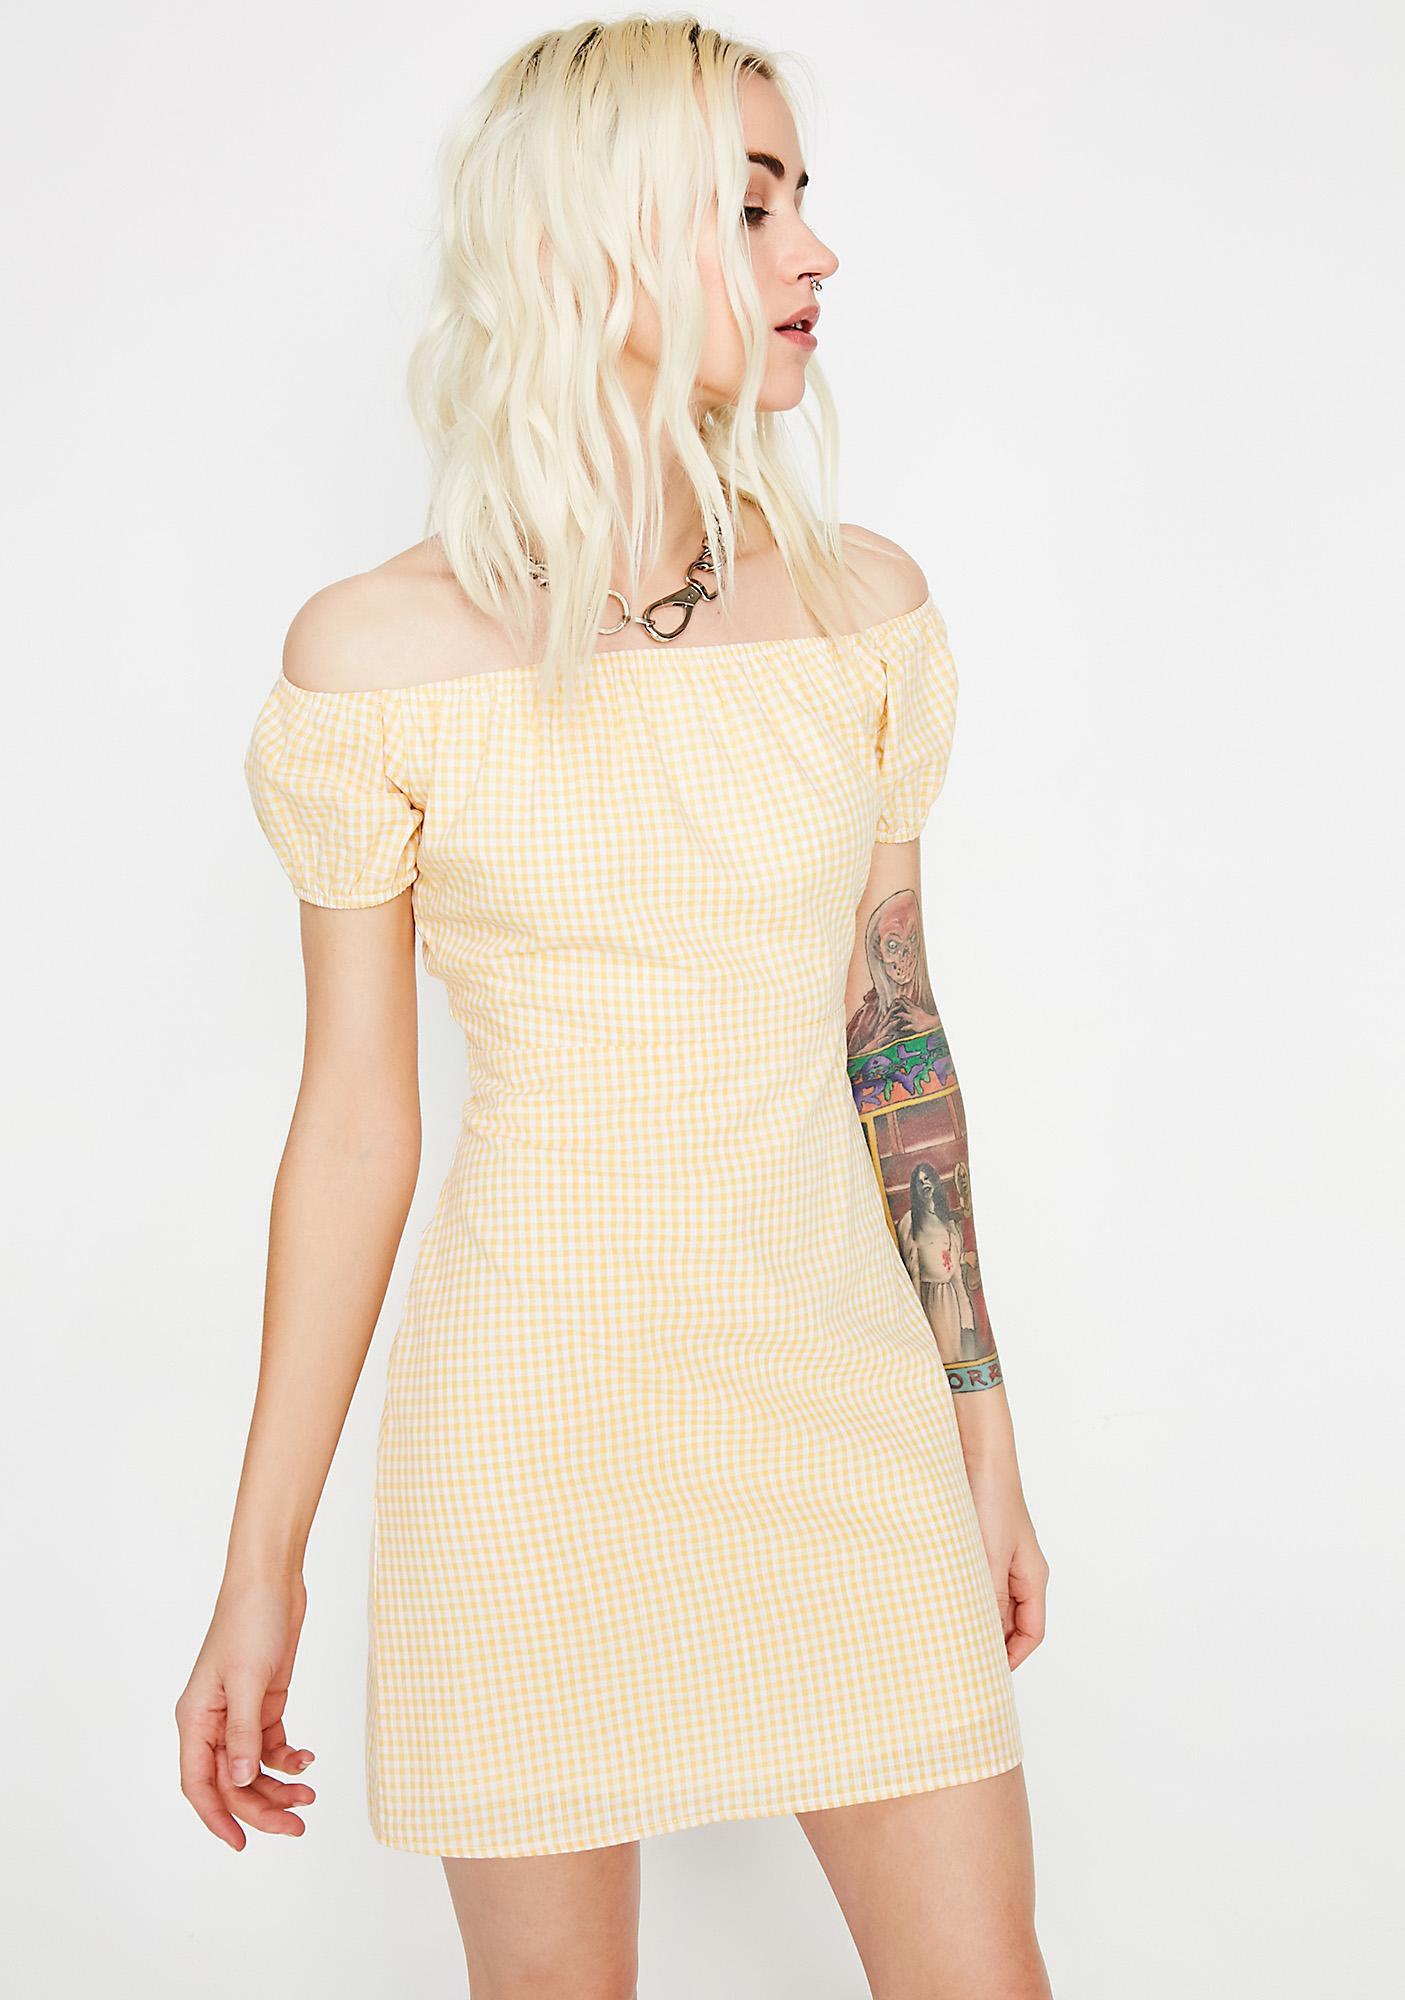 Sunny Hunny Gingham Dress